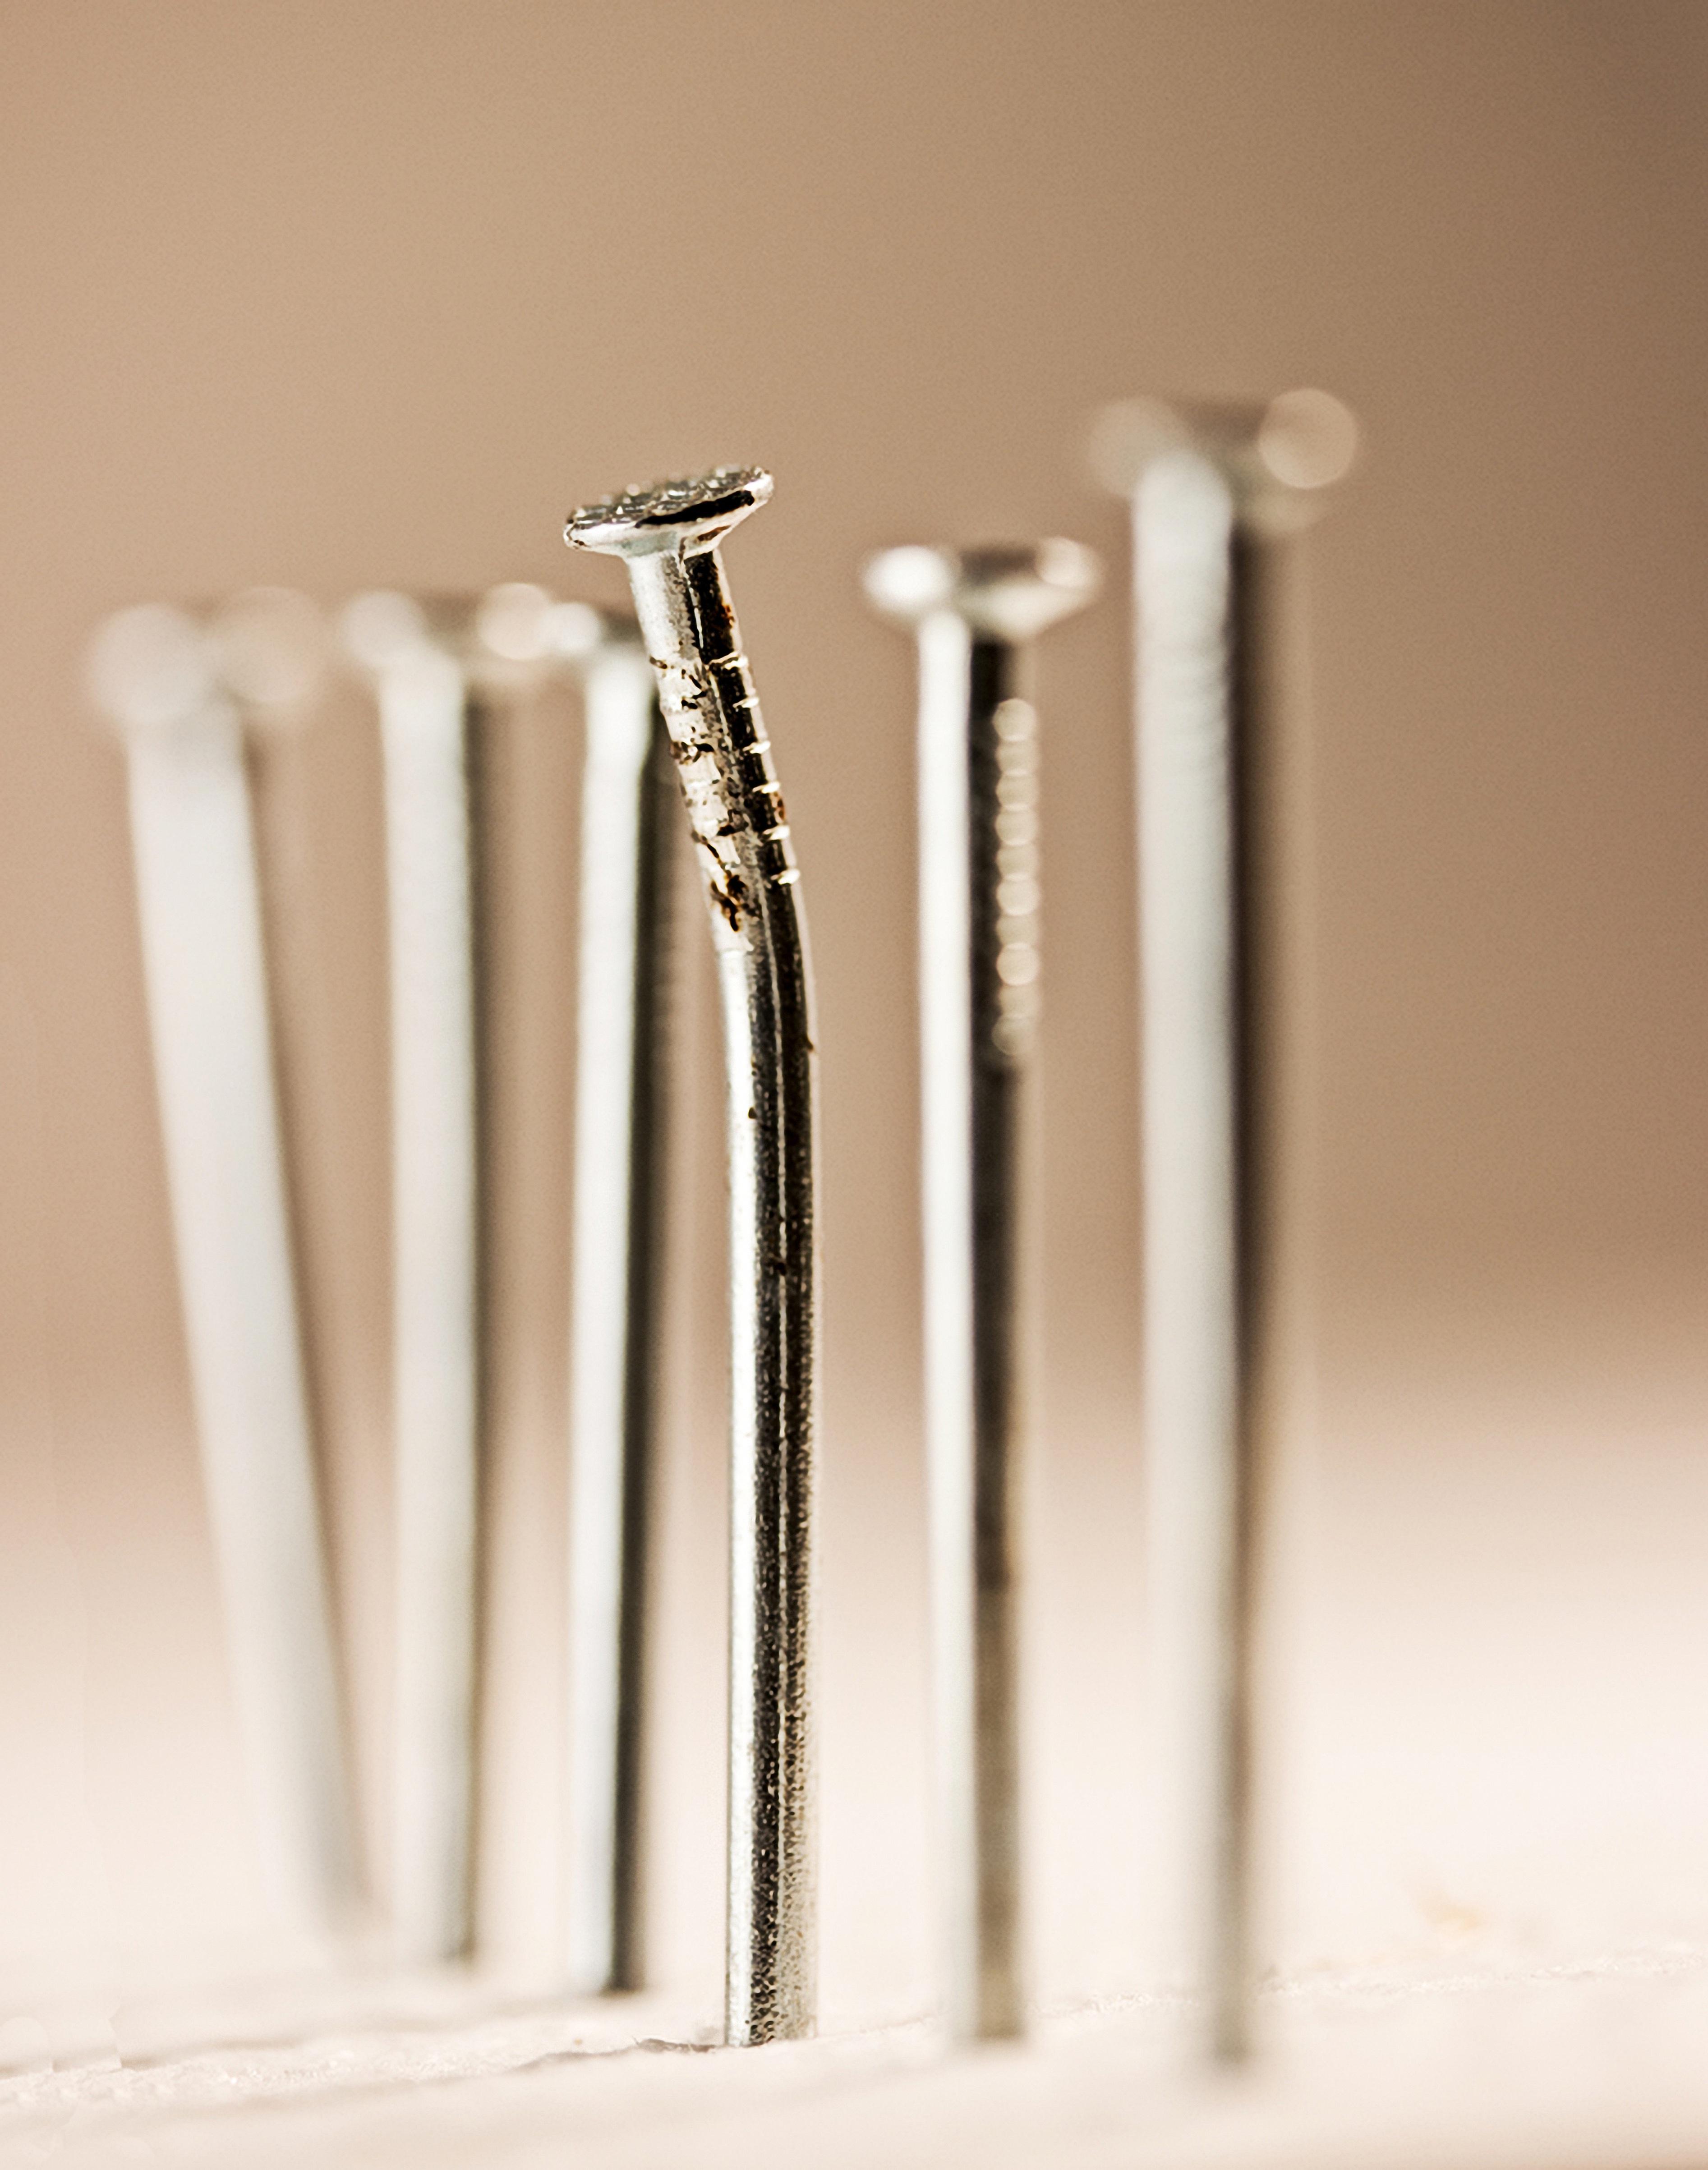 Free Images : wood, column, lighting, nails, nail head, metallstifte ...